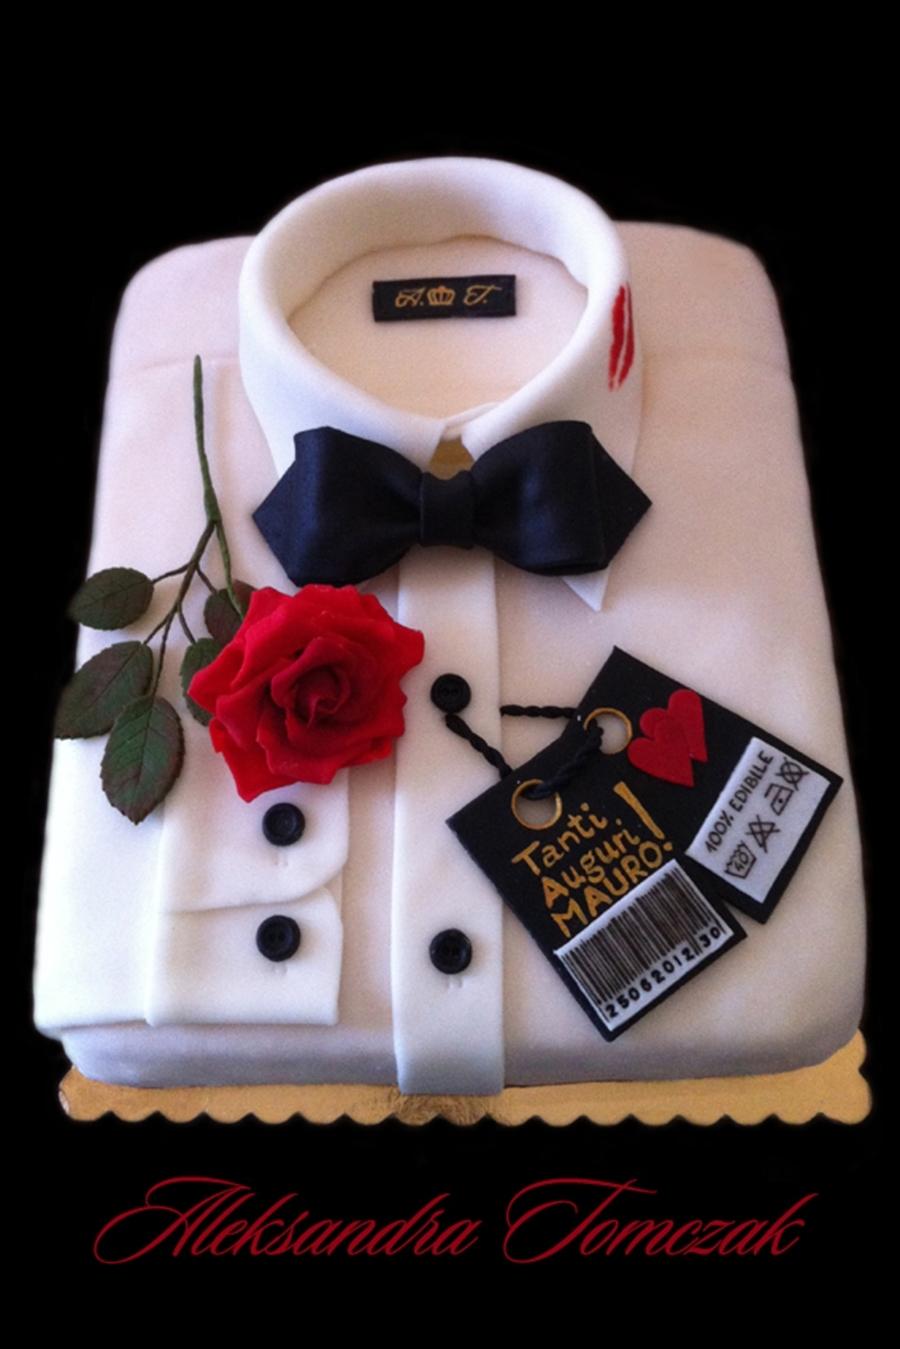 My Name Is Bond James Bond S Shirt Cake D